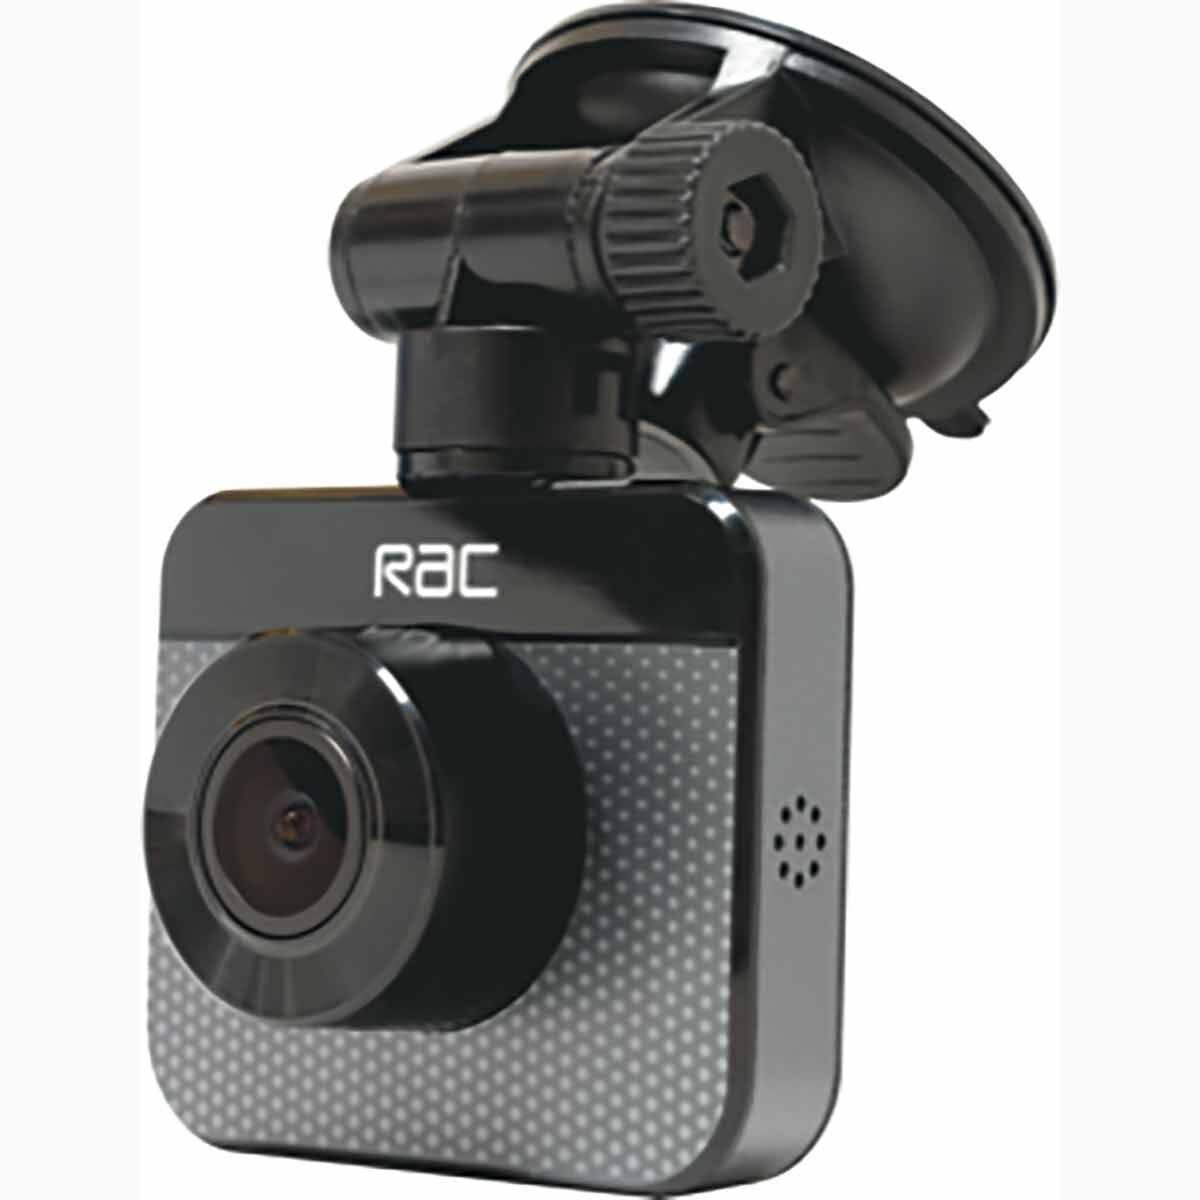 RAC 2000 Dash Camera